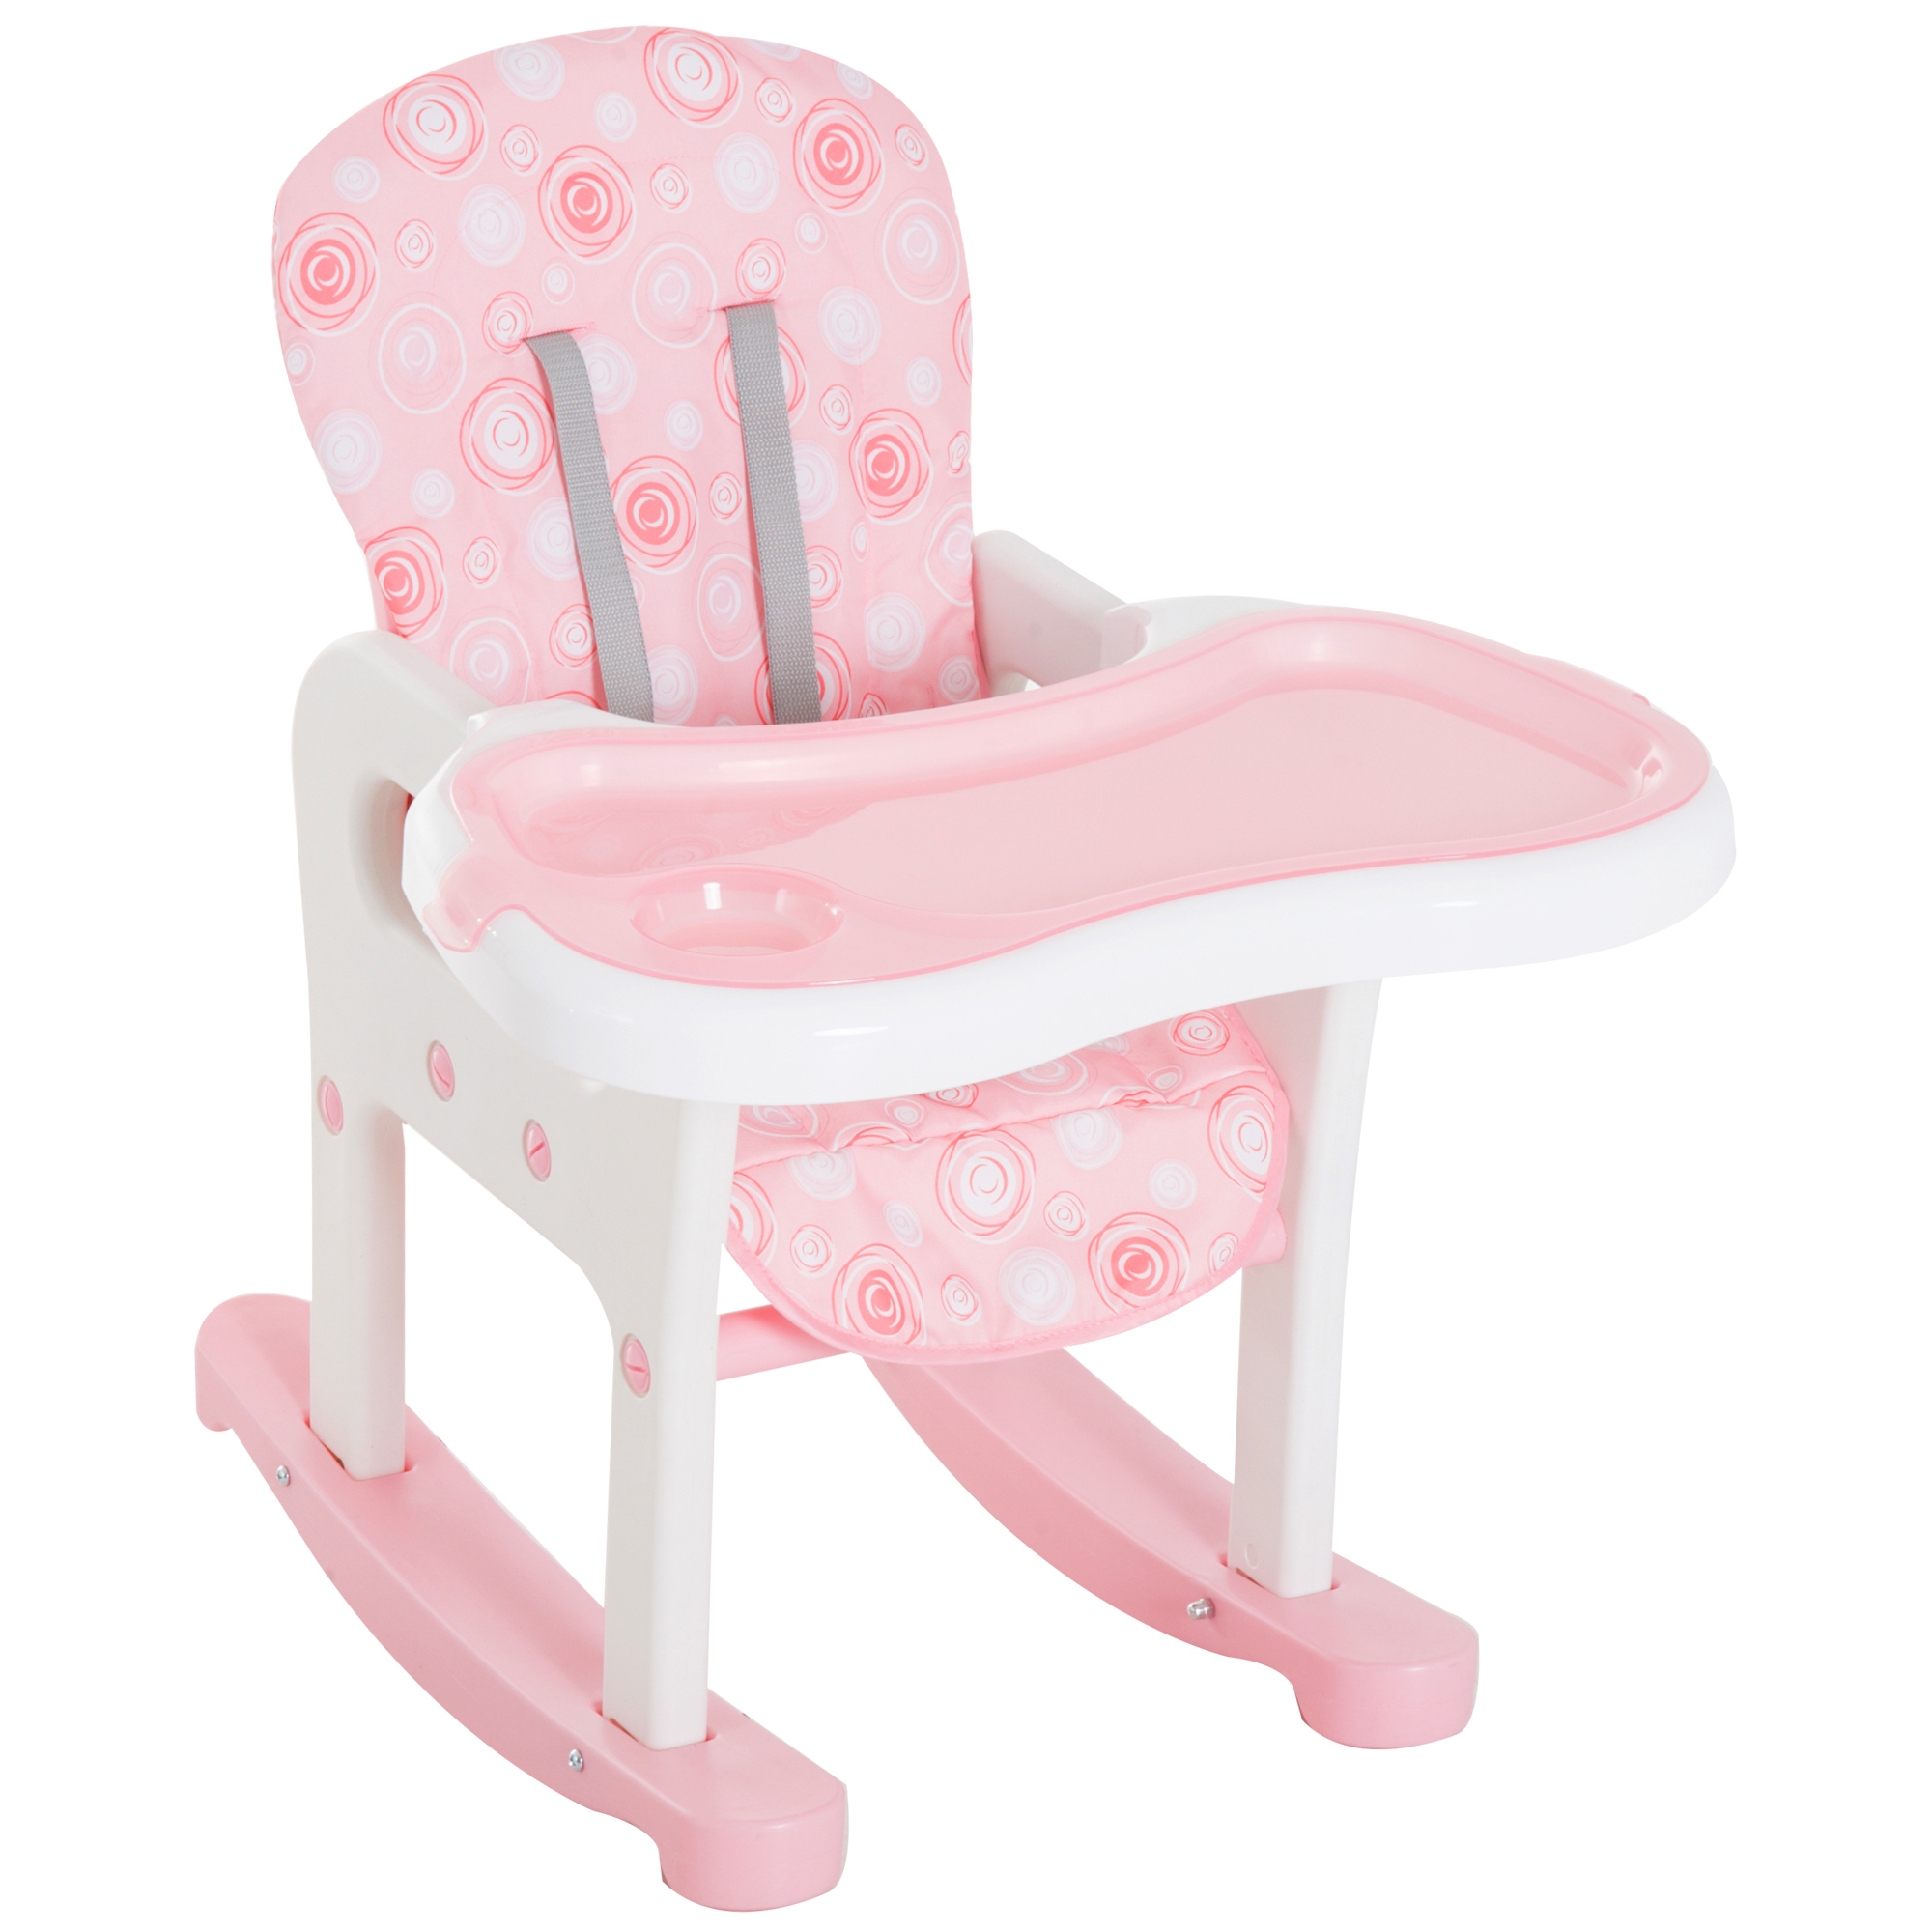 3 In 1 Kinderhochstuhl Kombihochstuhl Multifunktion Stuhl